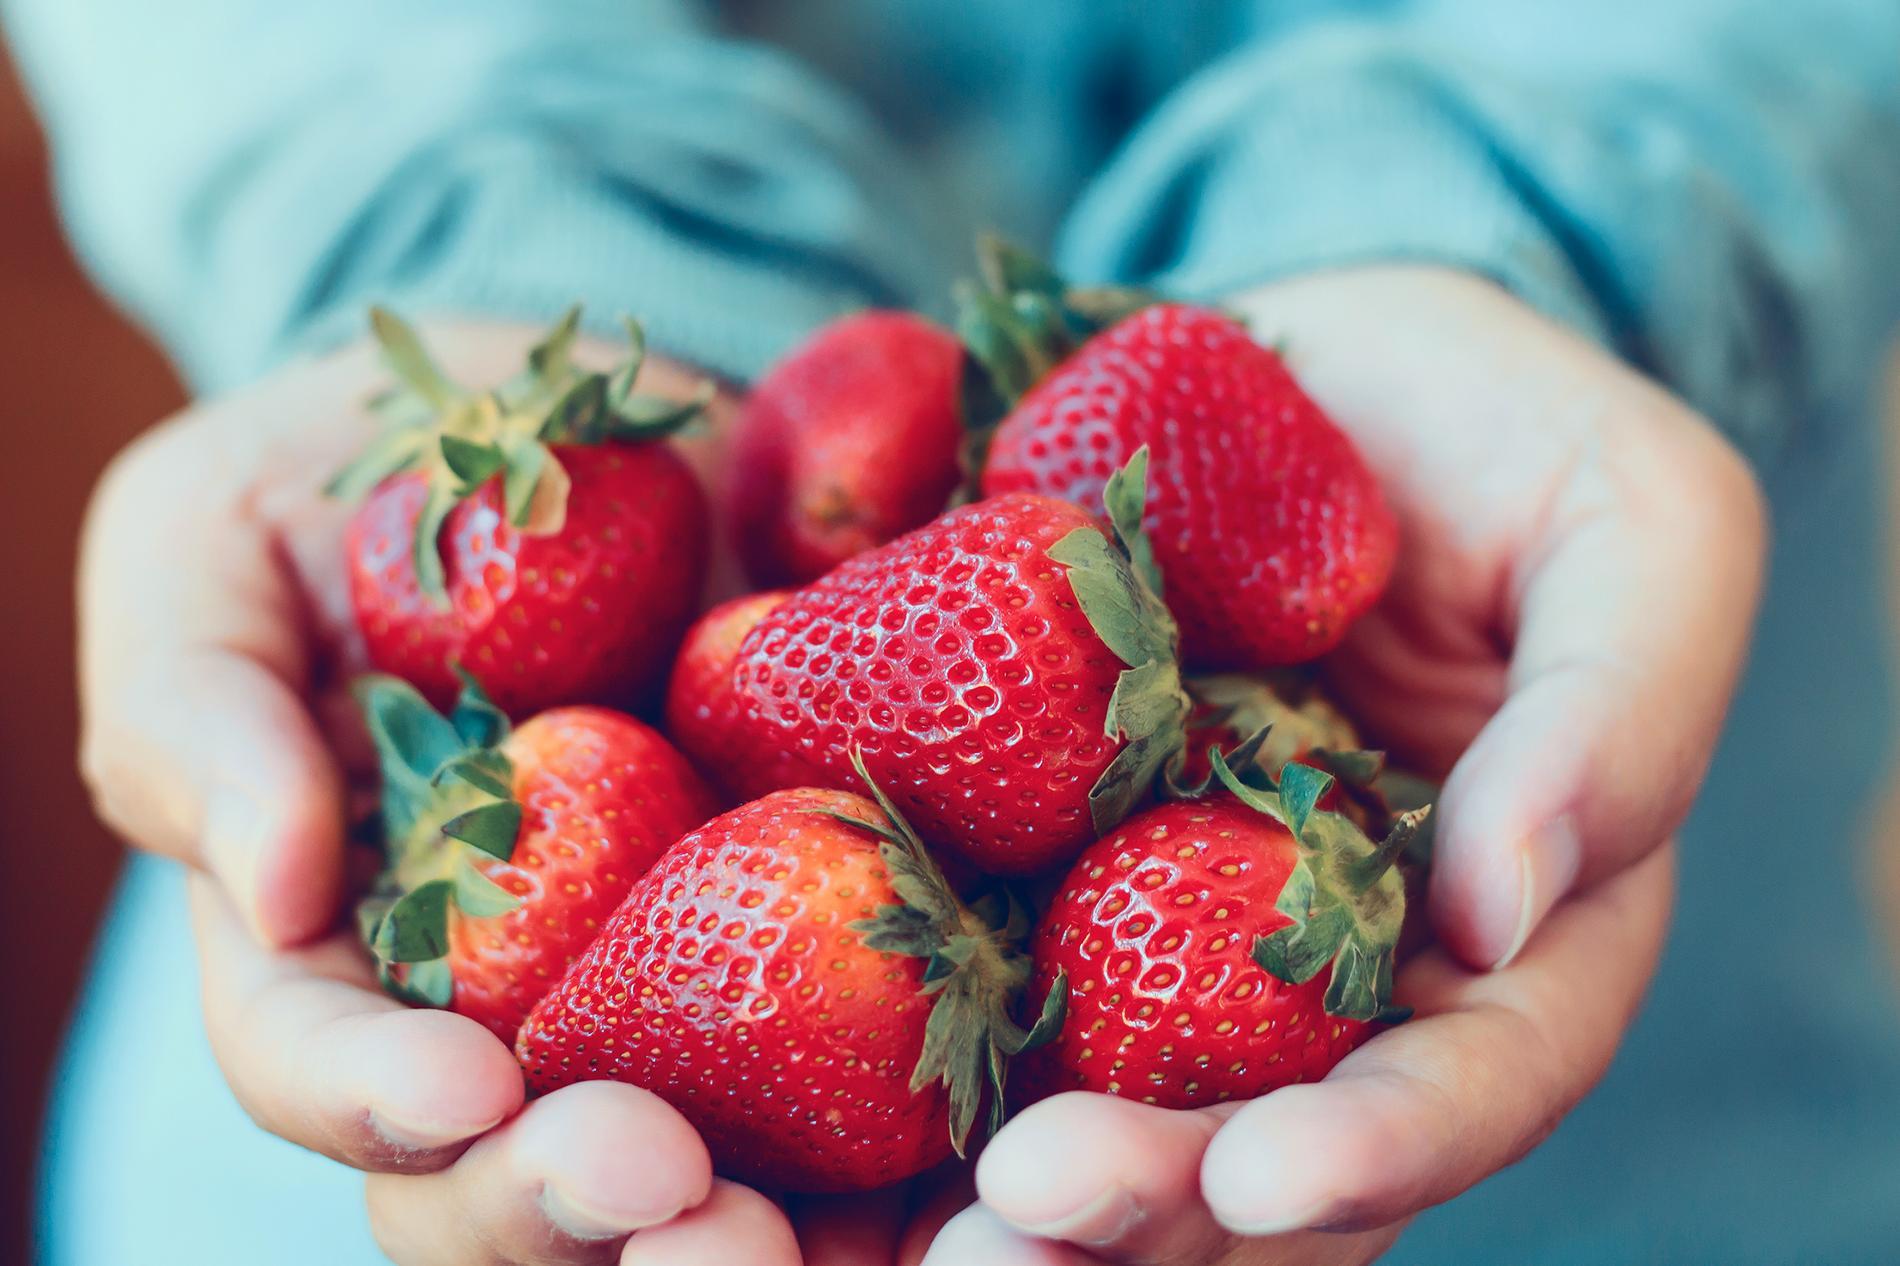 Garnera drinken med en jordgubbe eller limeskiva.